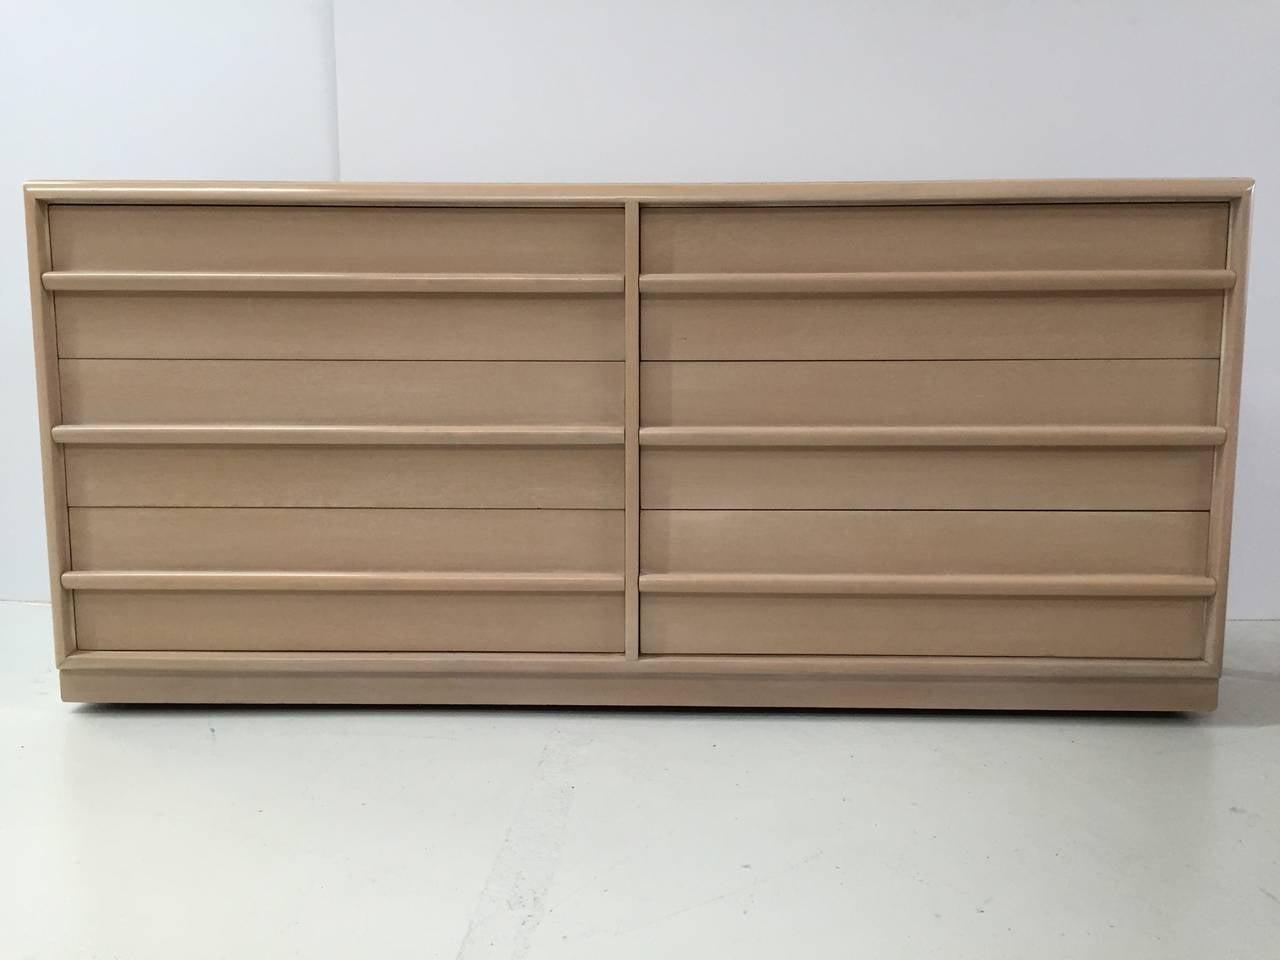 Dresser of drawers in bleached walnut by T.H. Robsjohn-Gibbings for Widdicomb.